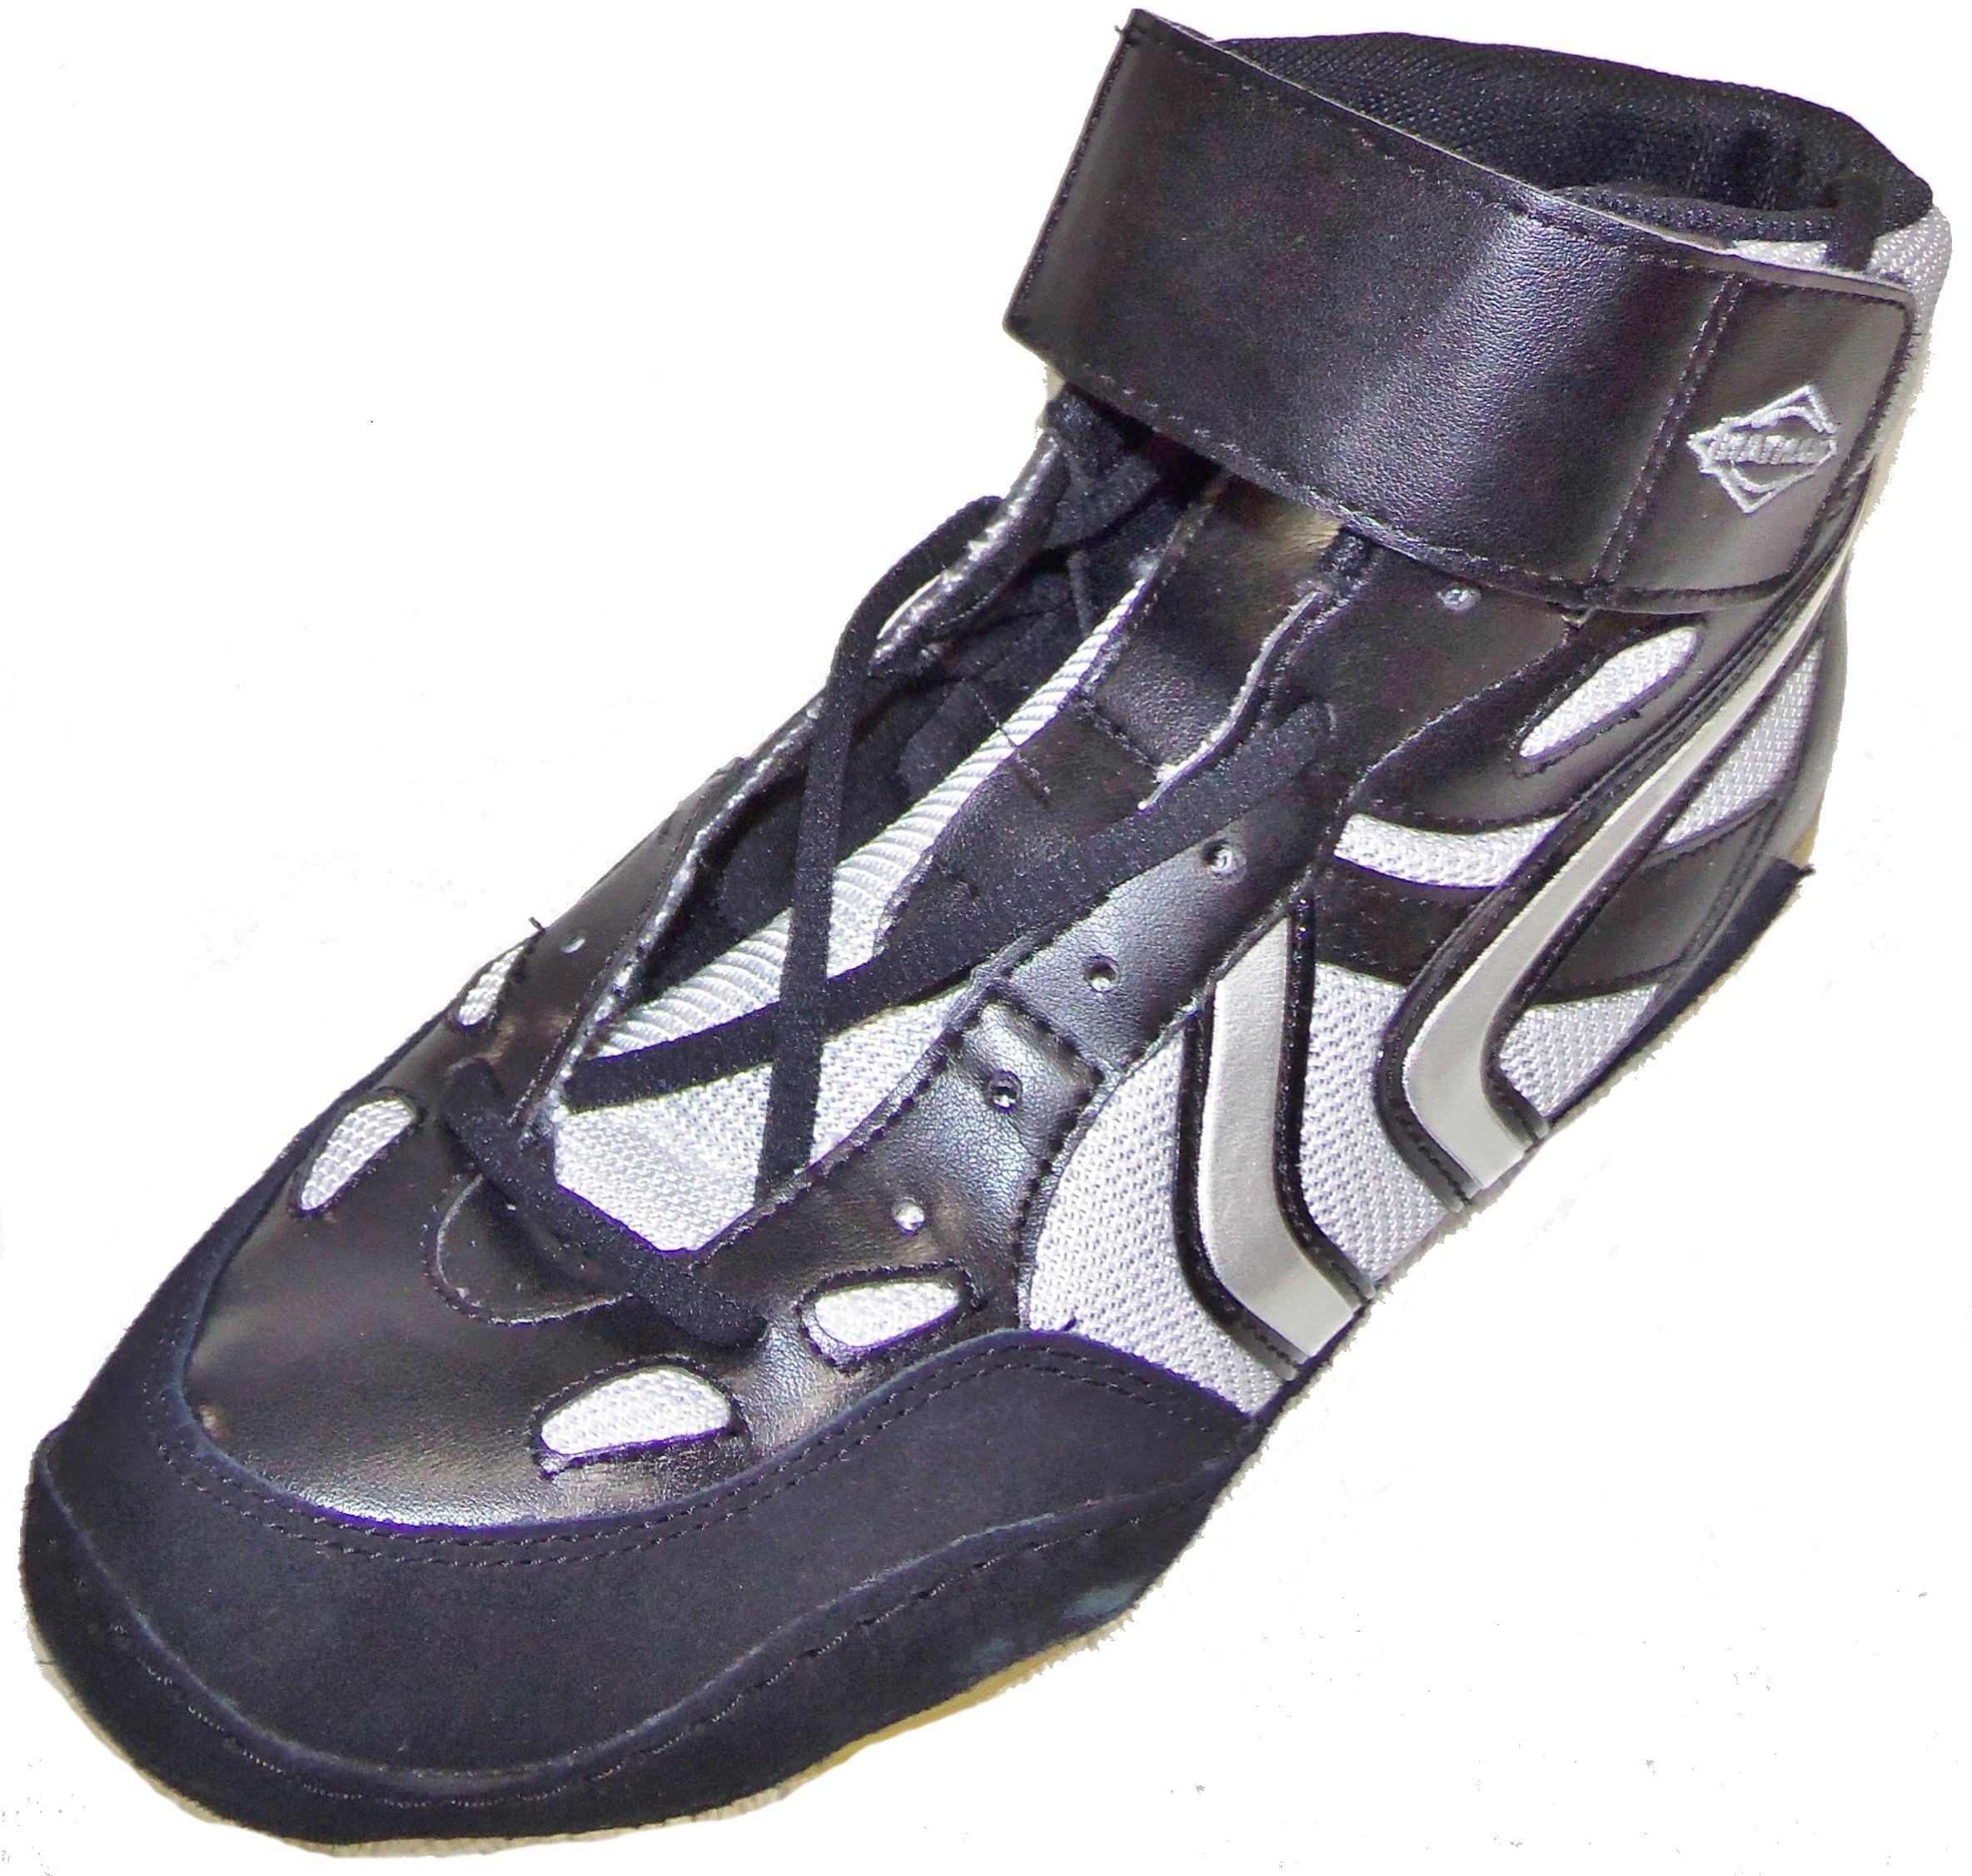 Matman Ultra G5 Revenge Adult Wrestling Shoes Black Silver S040 (9.5) by Matman